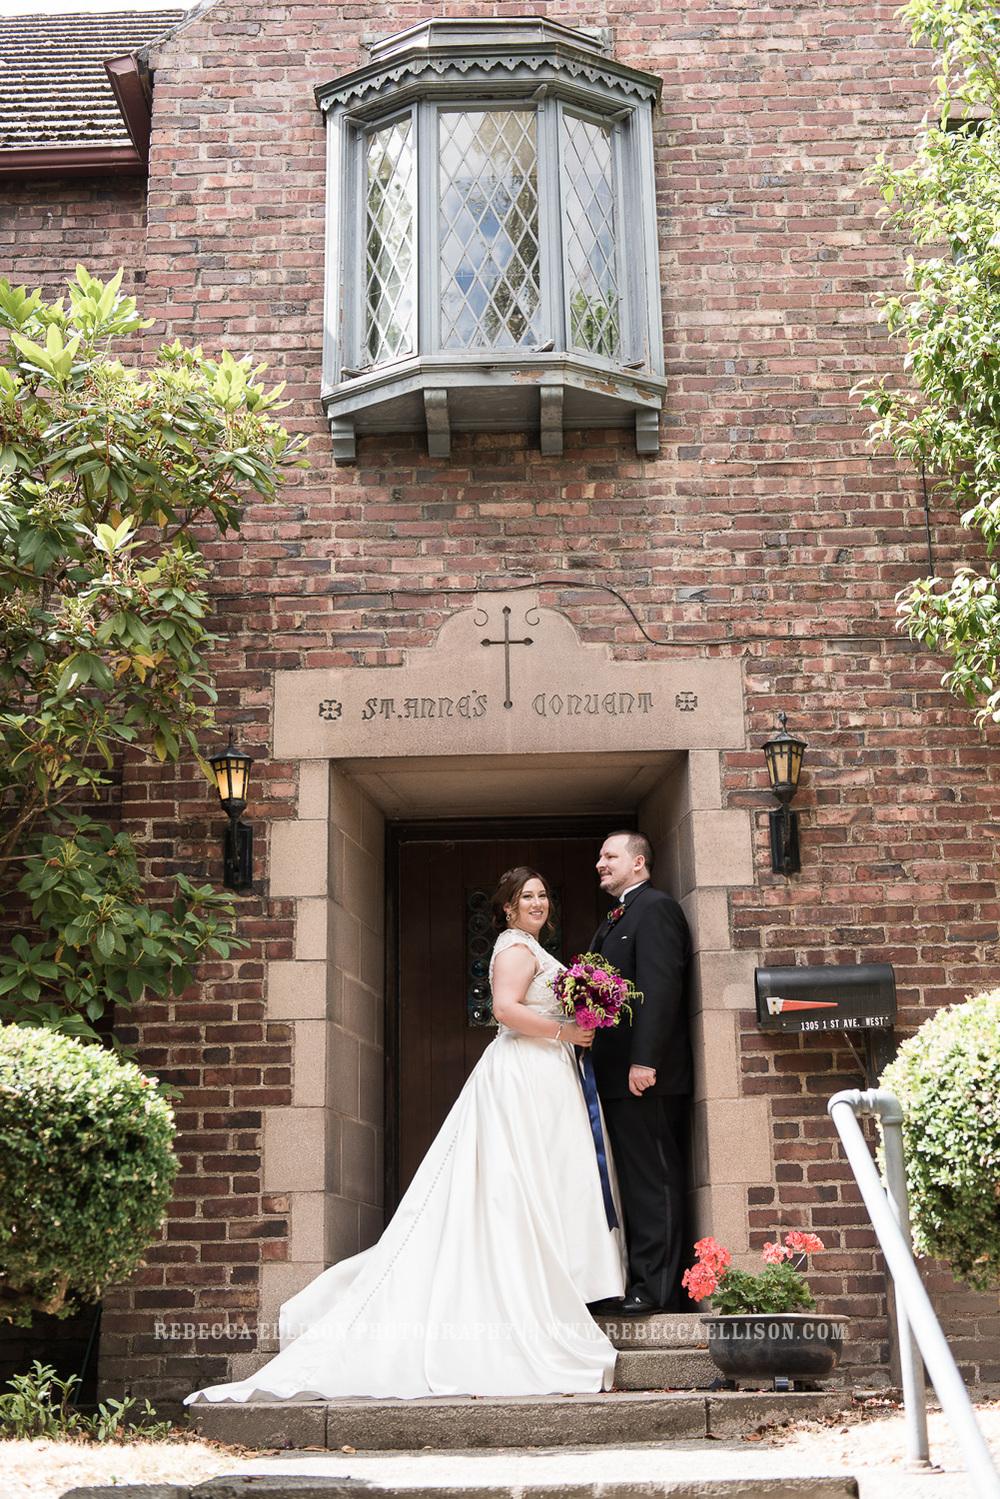 St-Annes-Church-Wedding-Queen-Anne-Hill-Seattle-0037.jpg